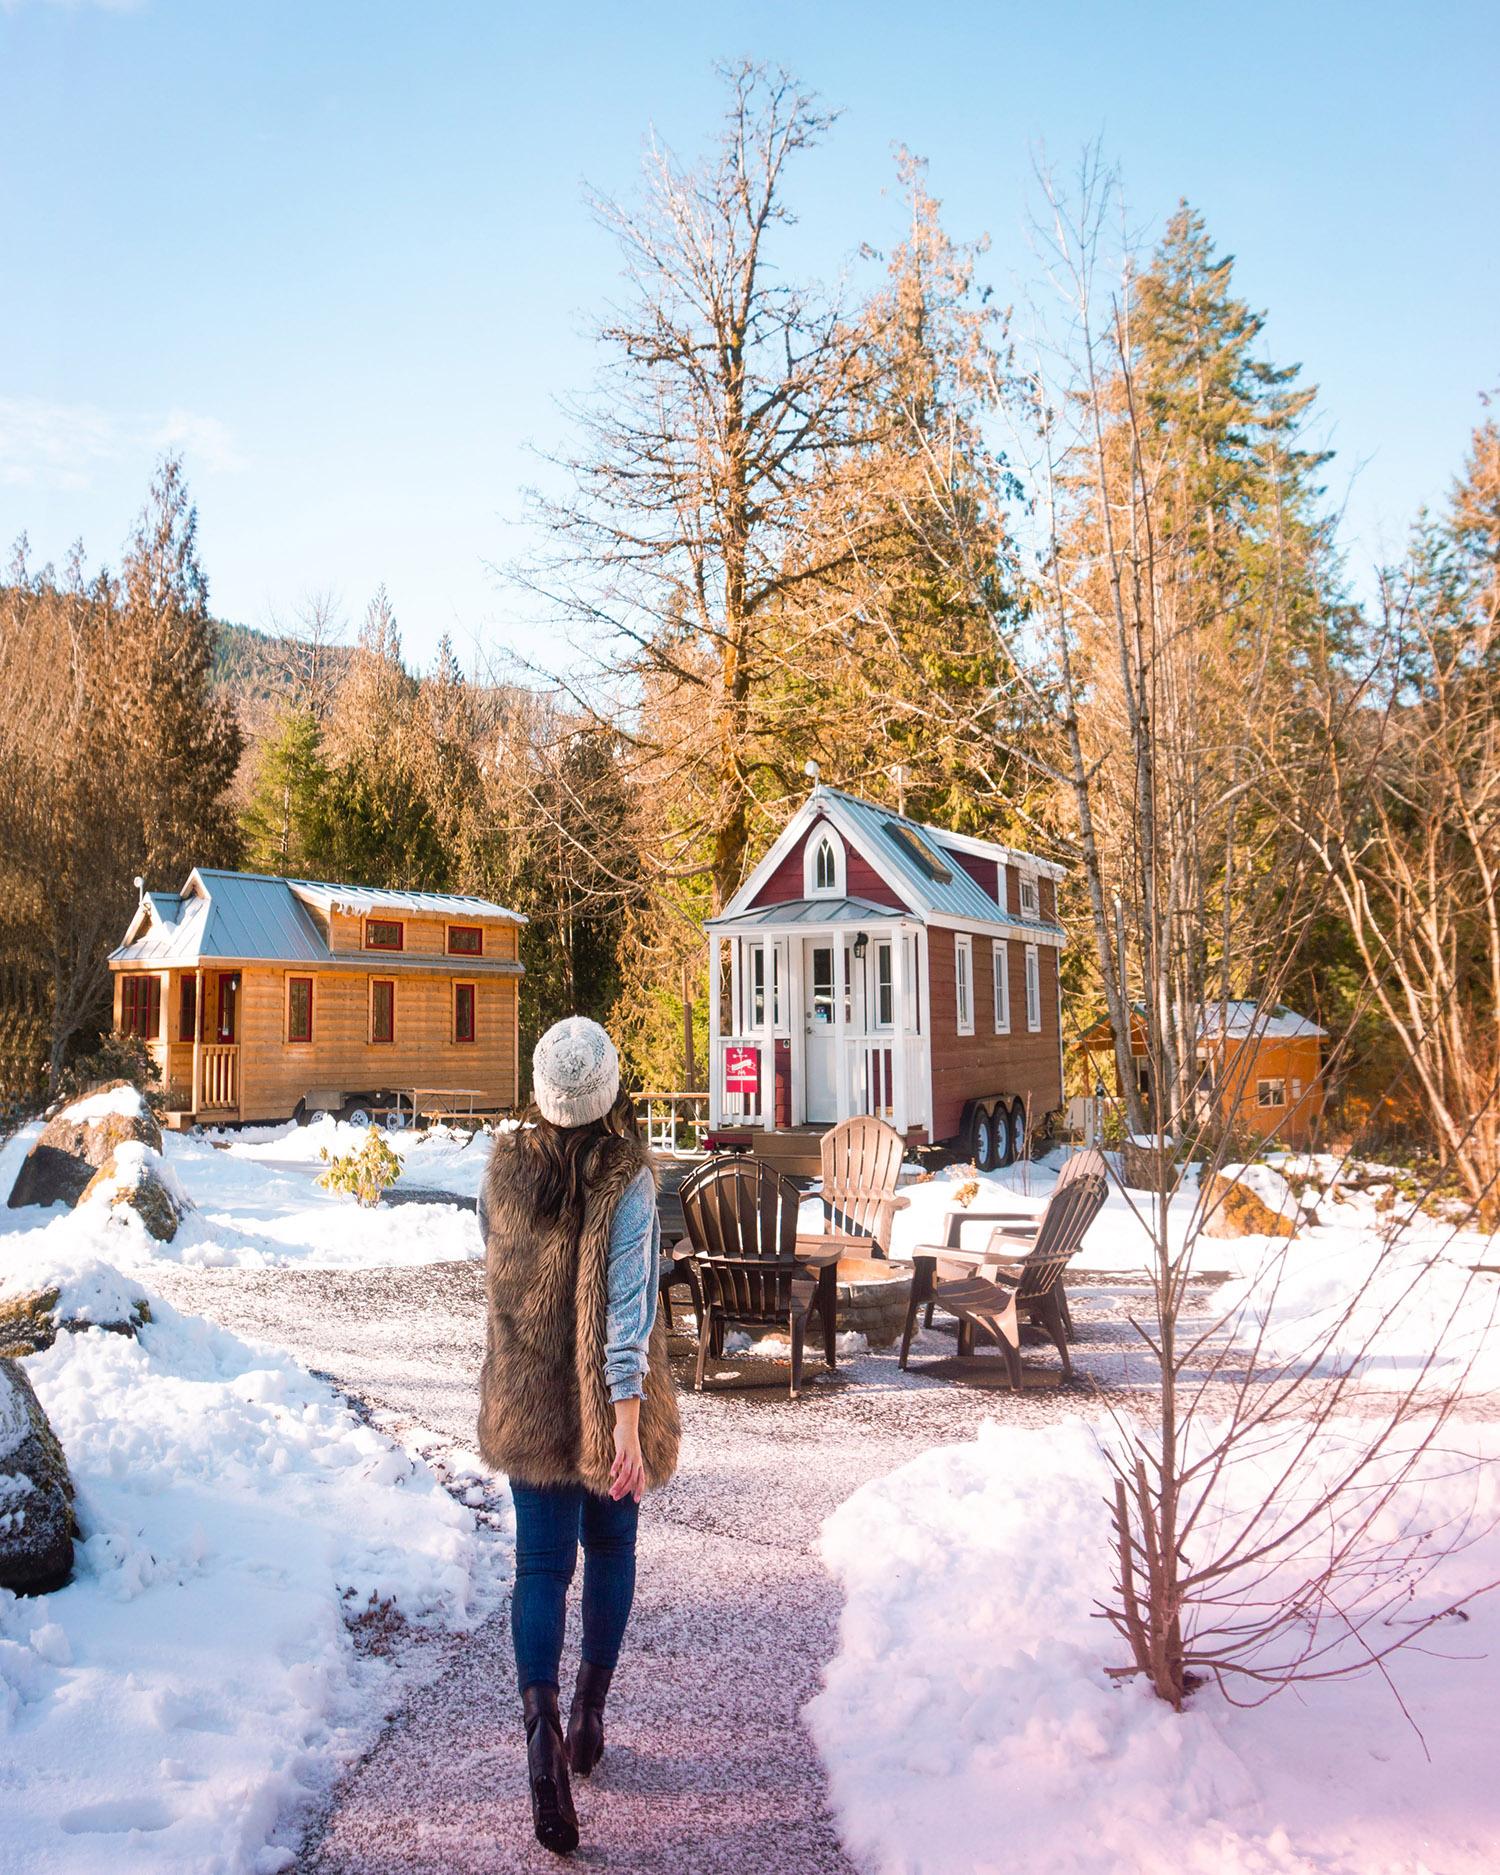 Mt. Hood Tiny Home Village